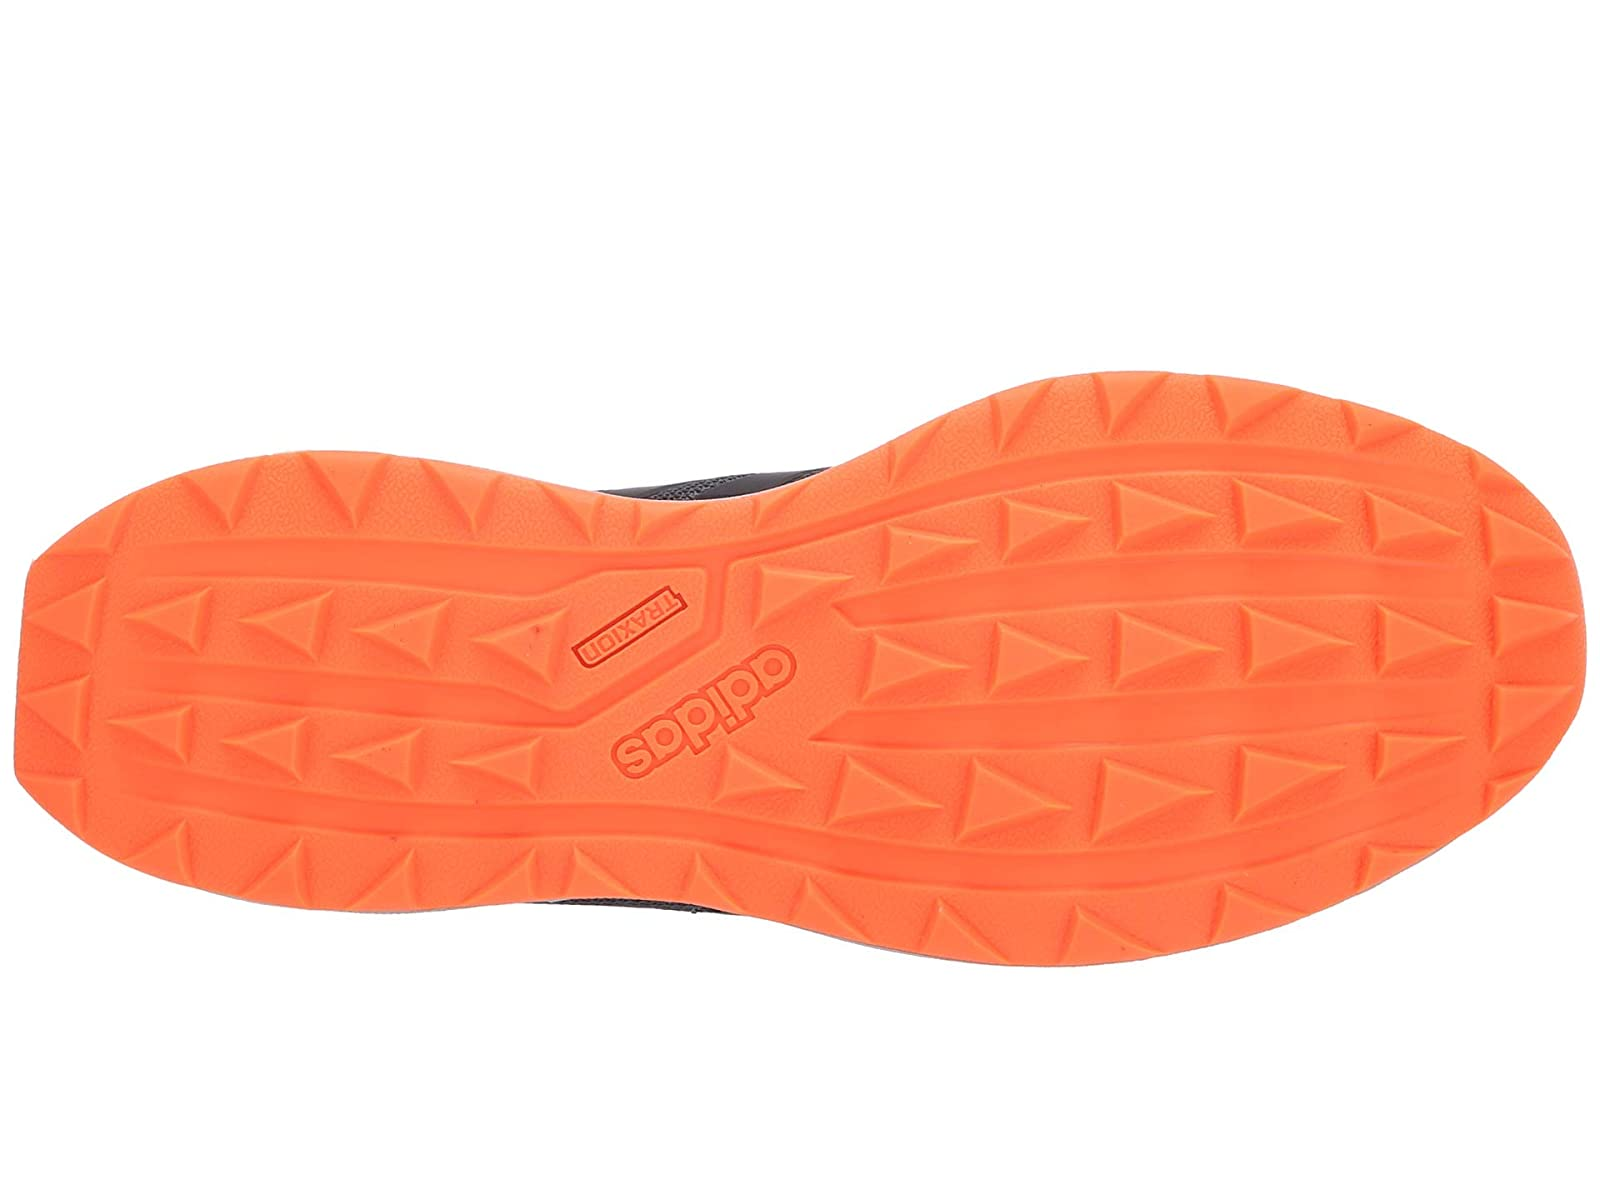 homme homme homme / femme's-adidas running questar trail forte r é à la chaleur; aab7fa